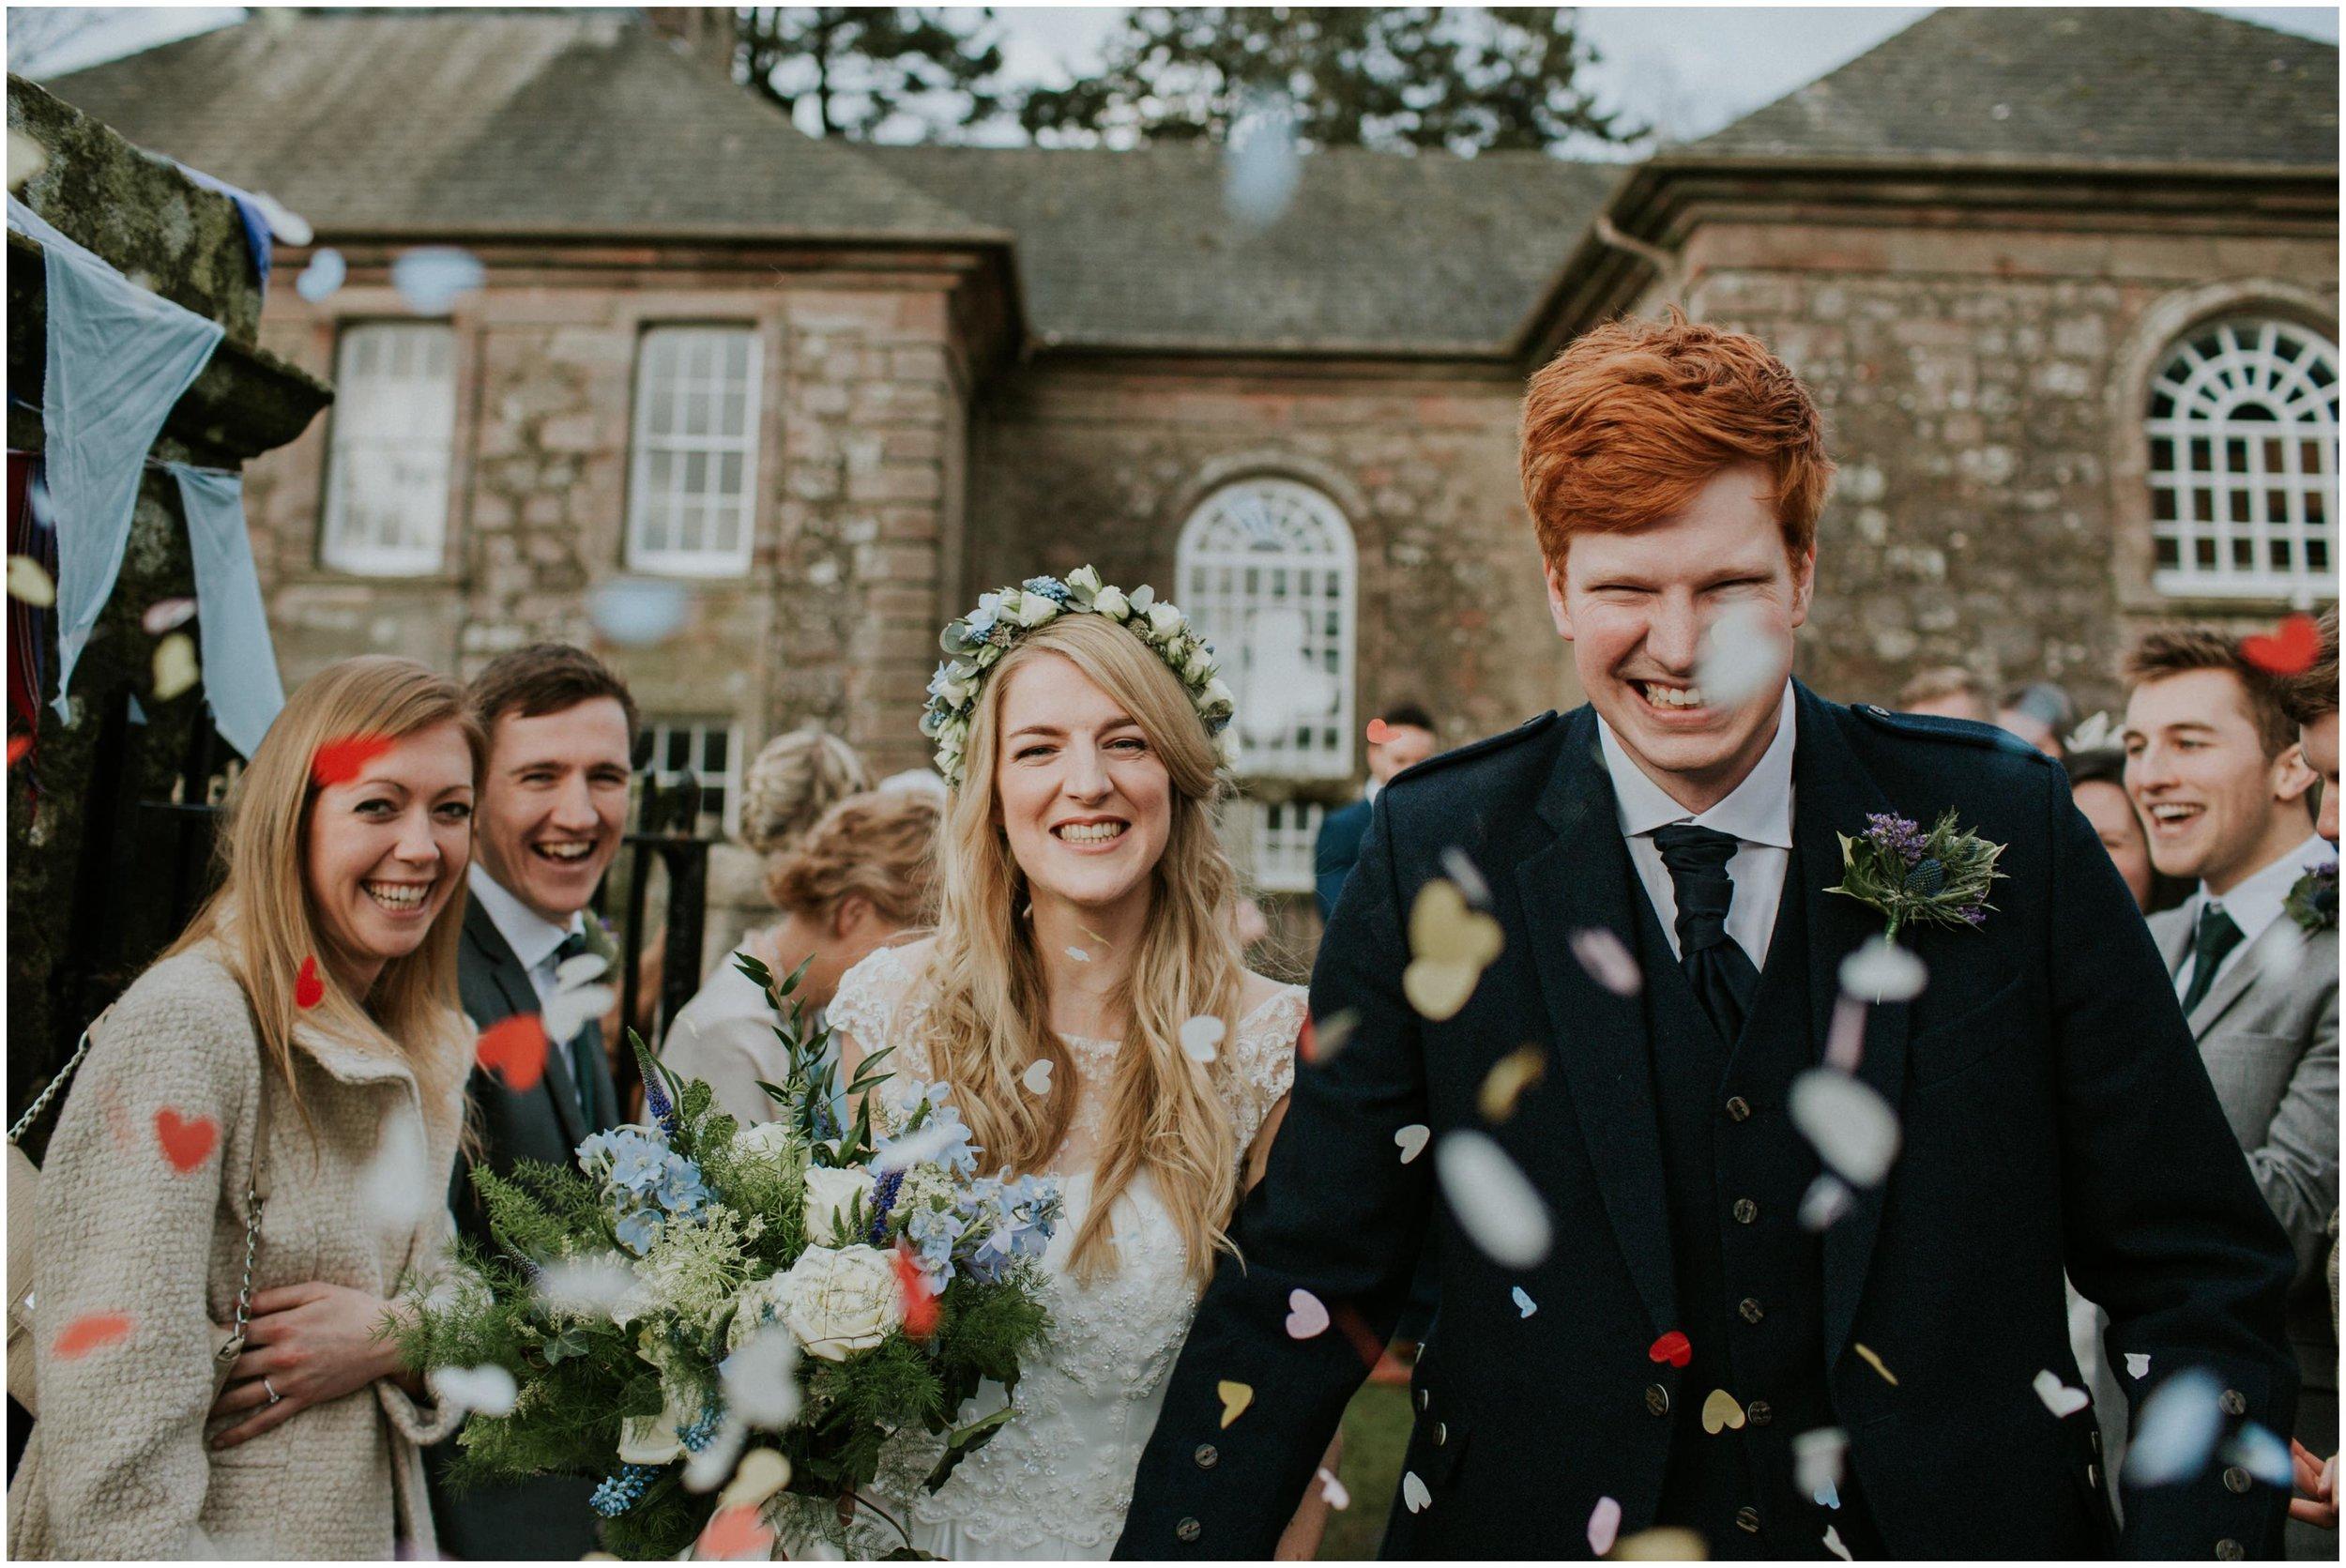 Photography 78 - Glasgow Wedding Photographer - Dave & Alana_0051.jpg